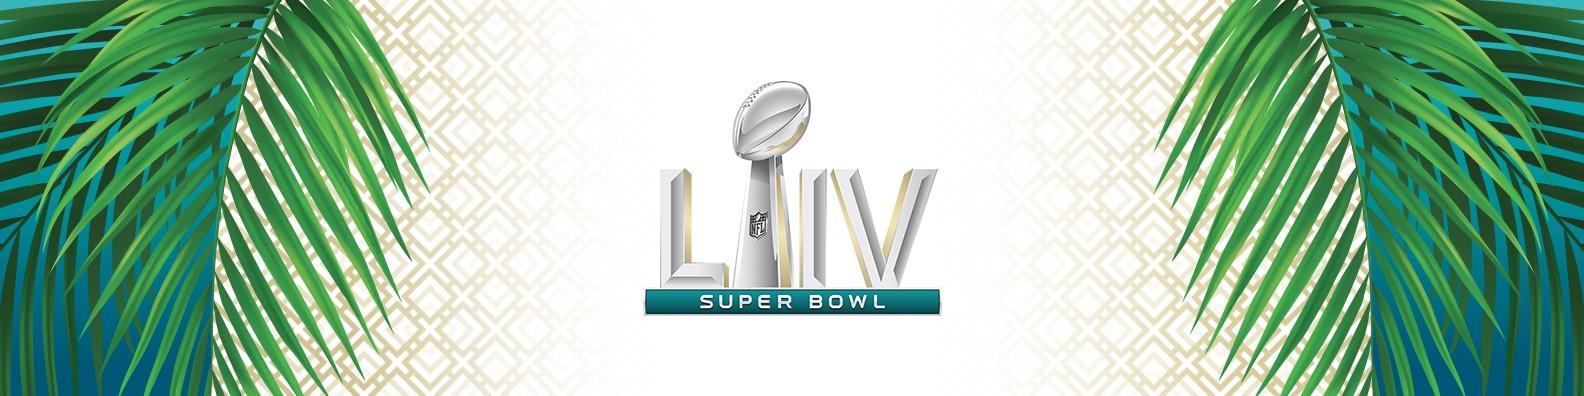 NFL On Location Experiences | LinkedIn